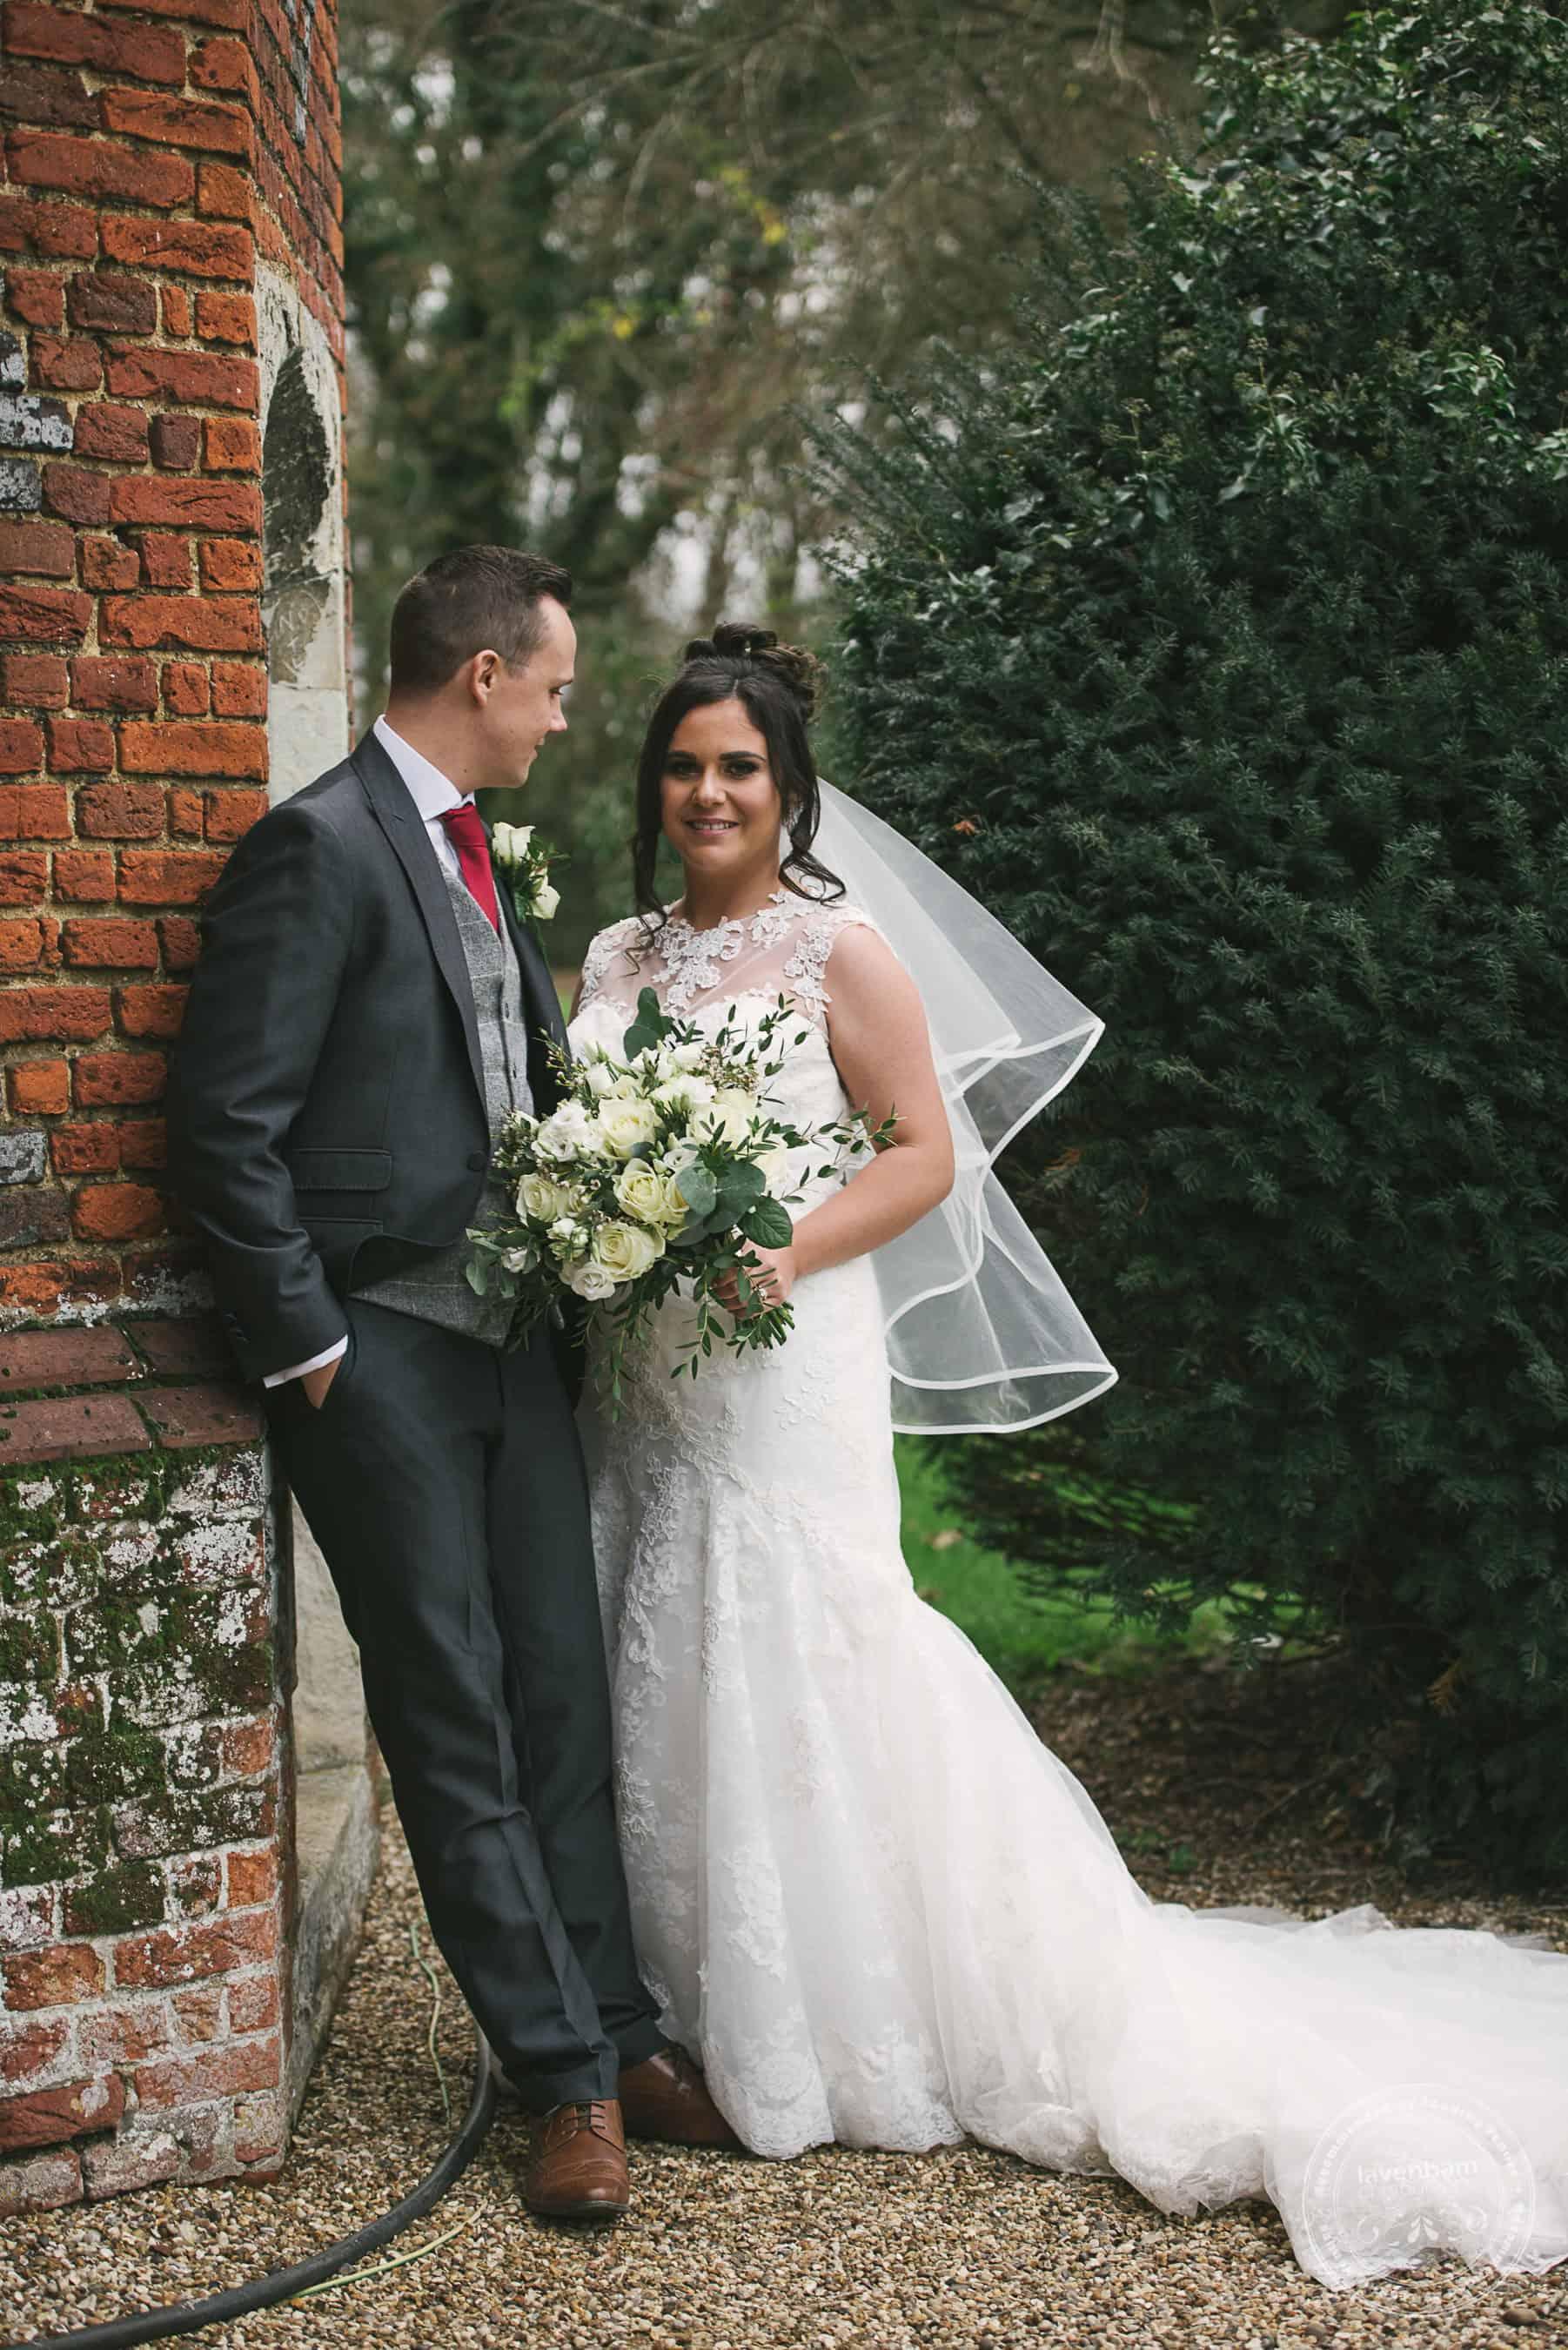 251118 Leez Priory Wedding Photography by Lavenham Photographic 088